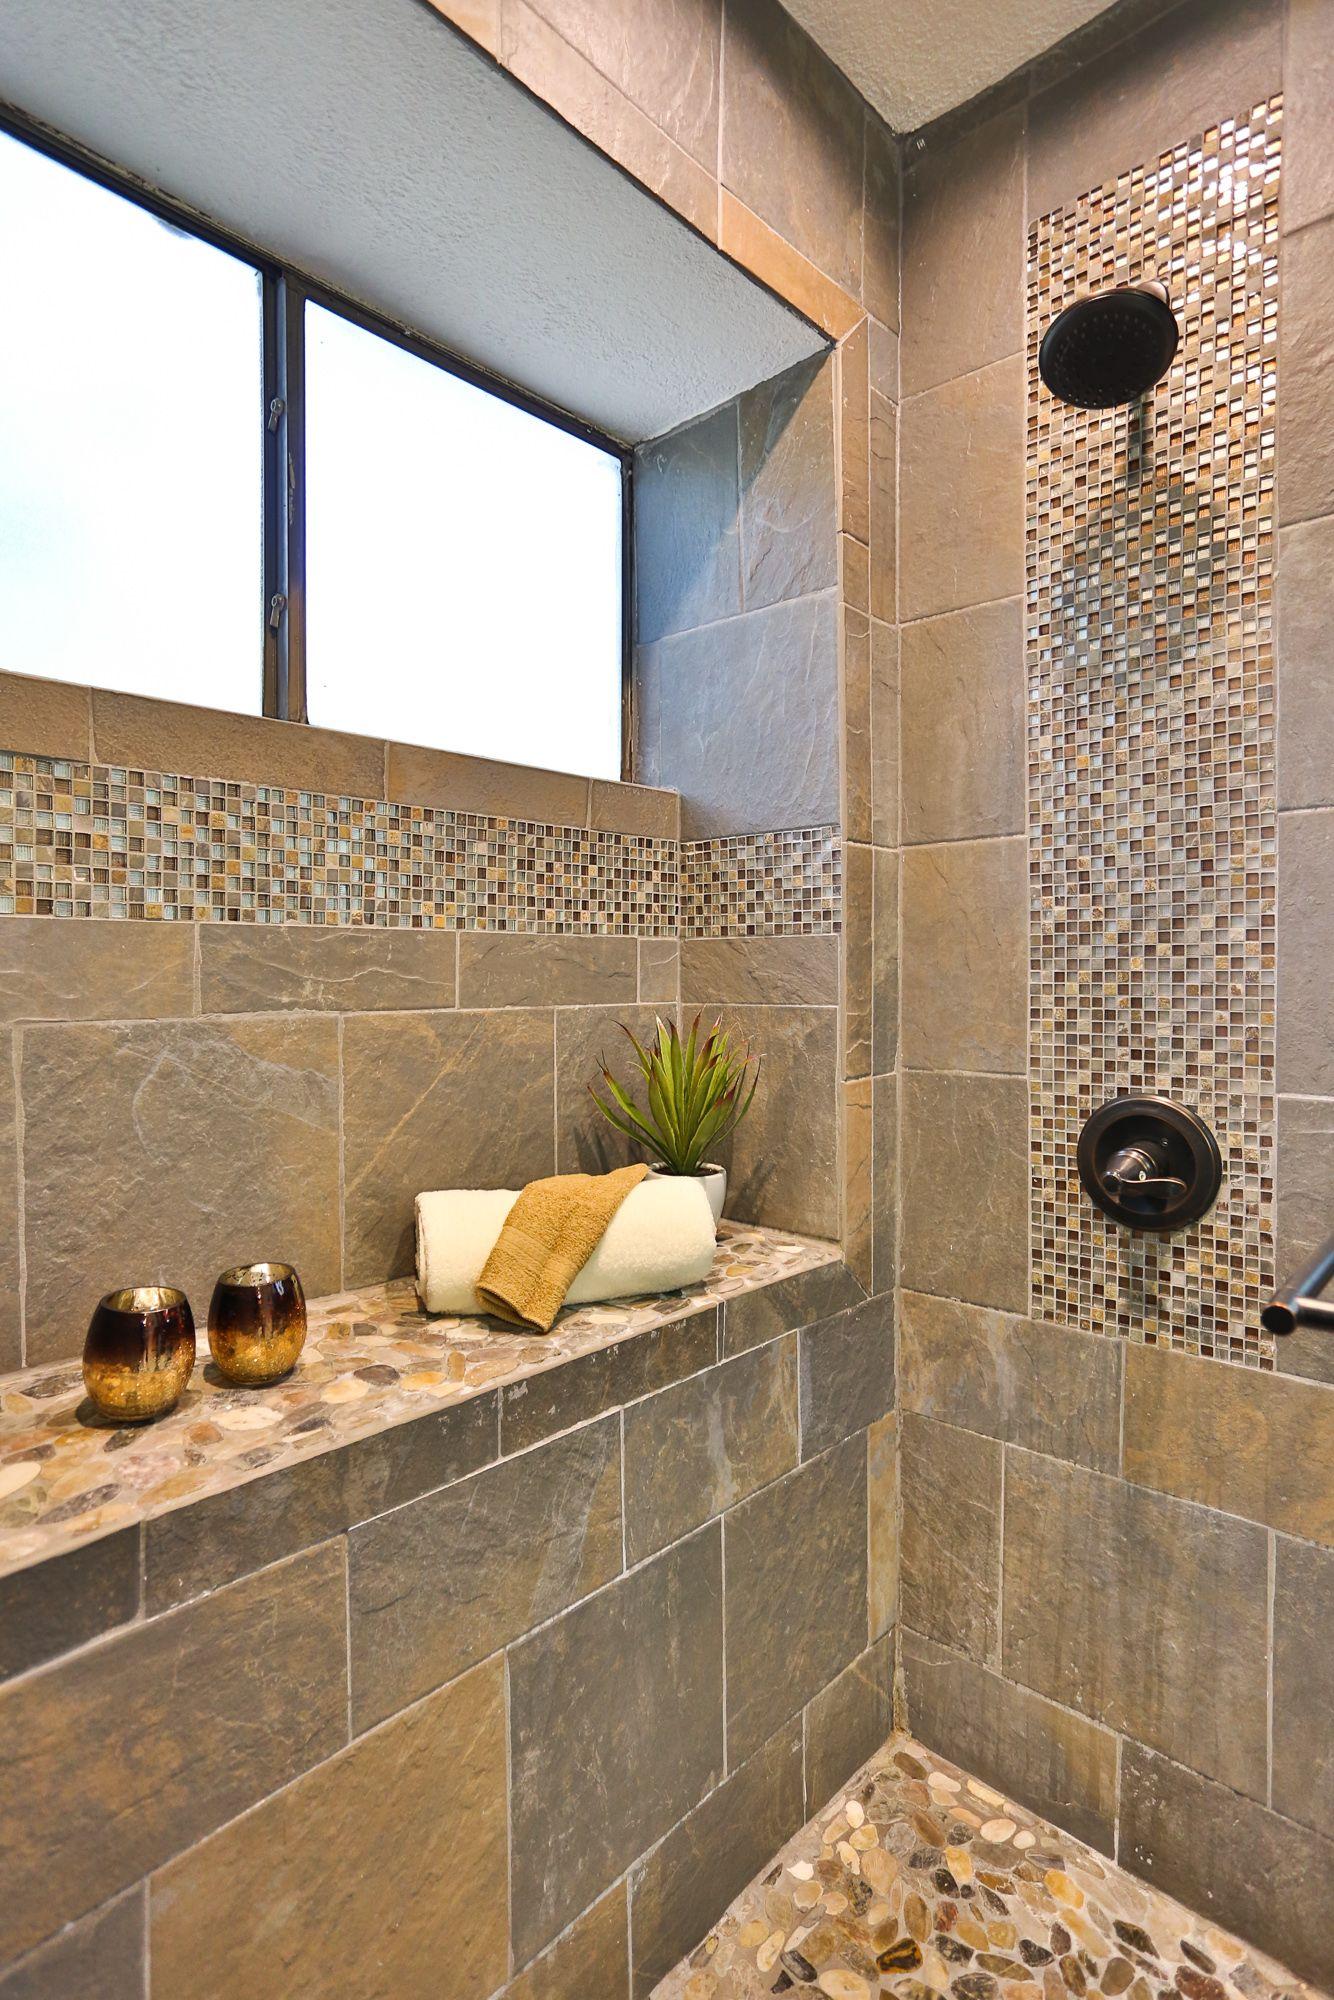 5723 Timber Rain San Antonio Tx 78250 Bathroom Stone Tiles Updated Kitchen